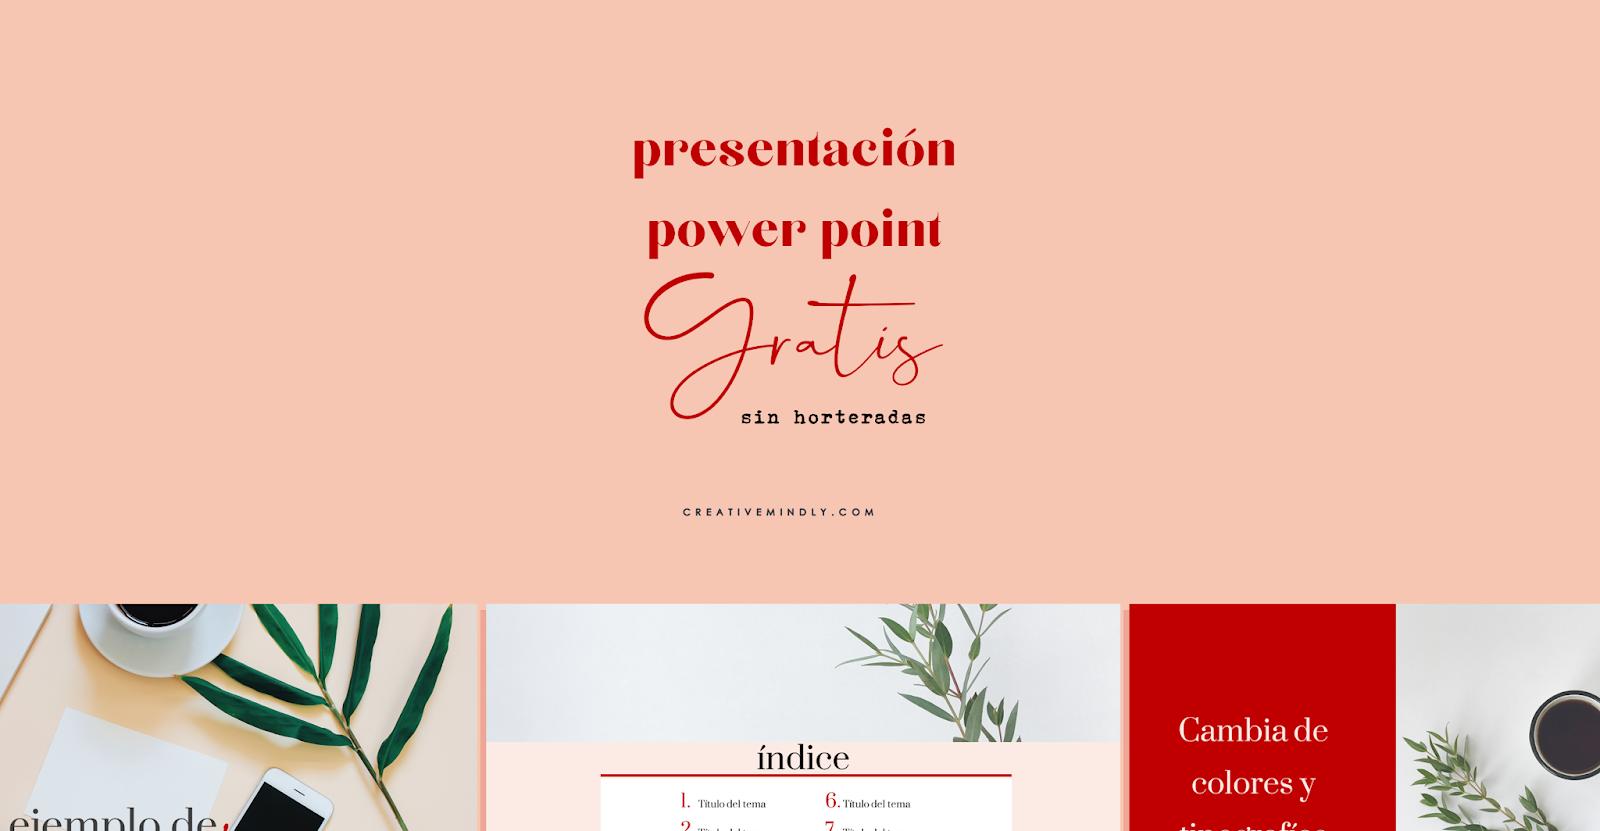 presentacion power point gratis bonita descargar